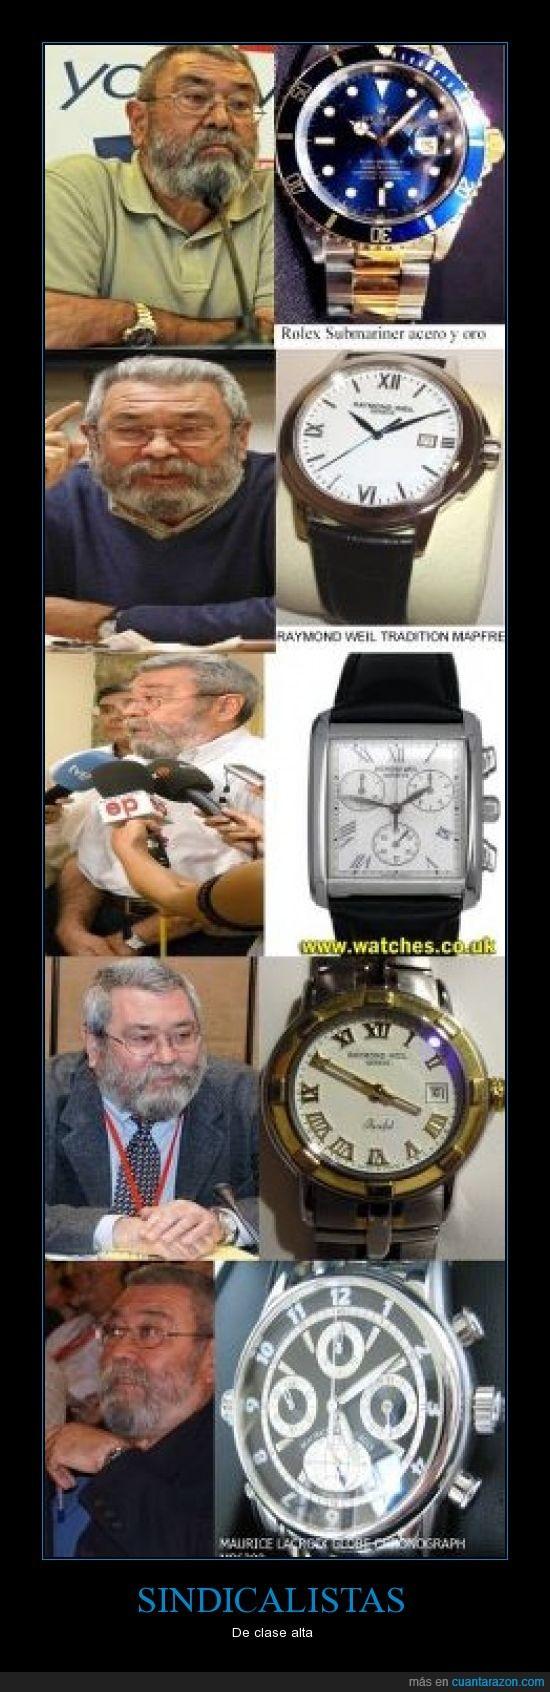 25000 euros,cinco relojes,estado,pagados,sindicalistas